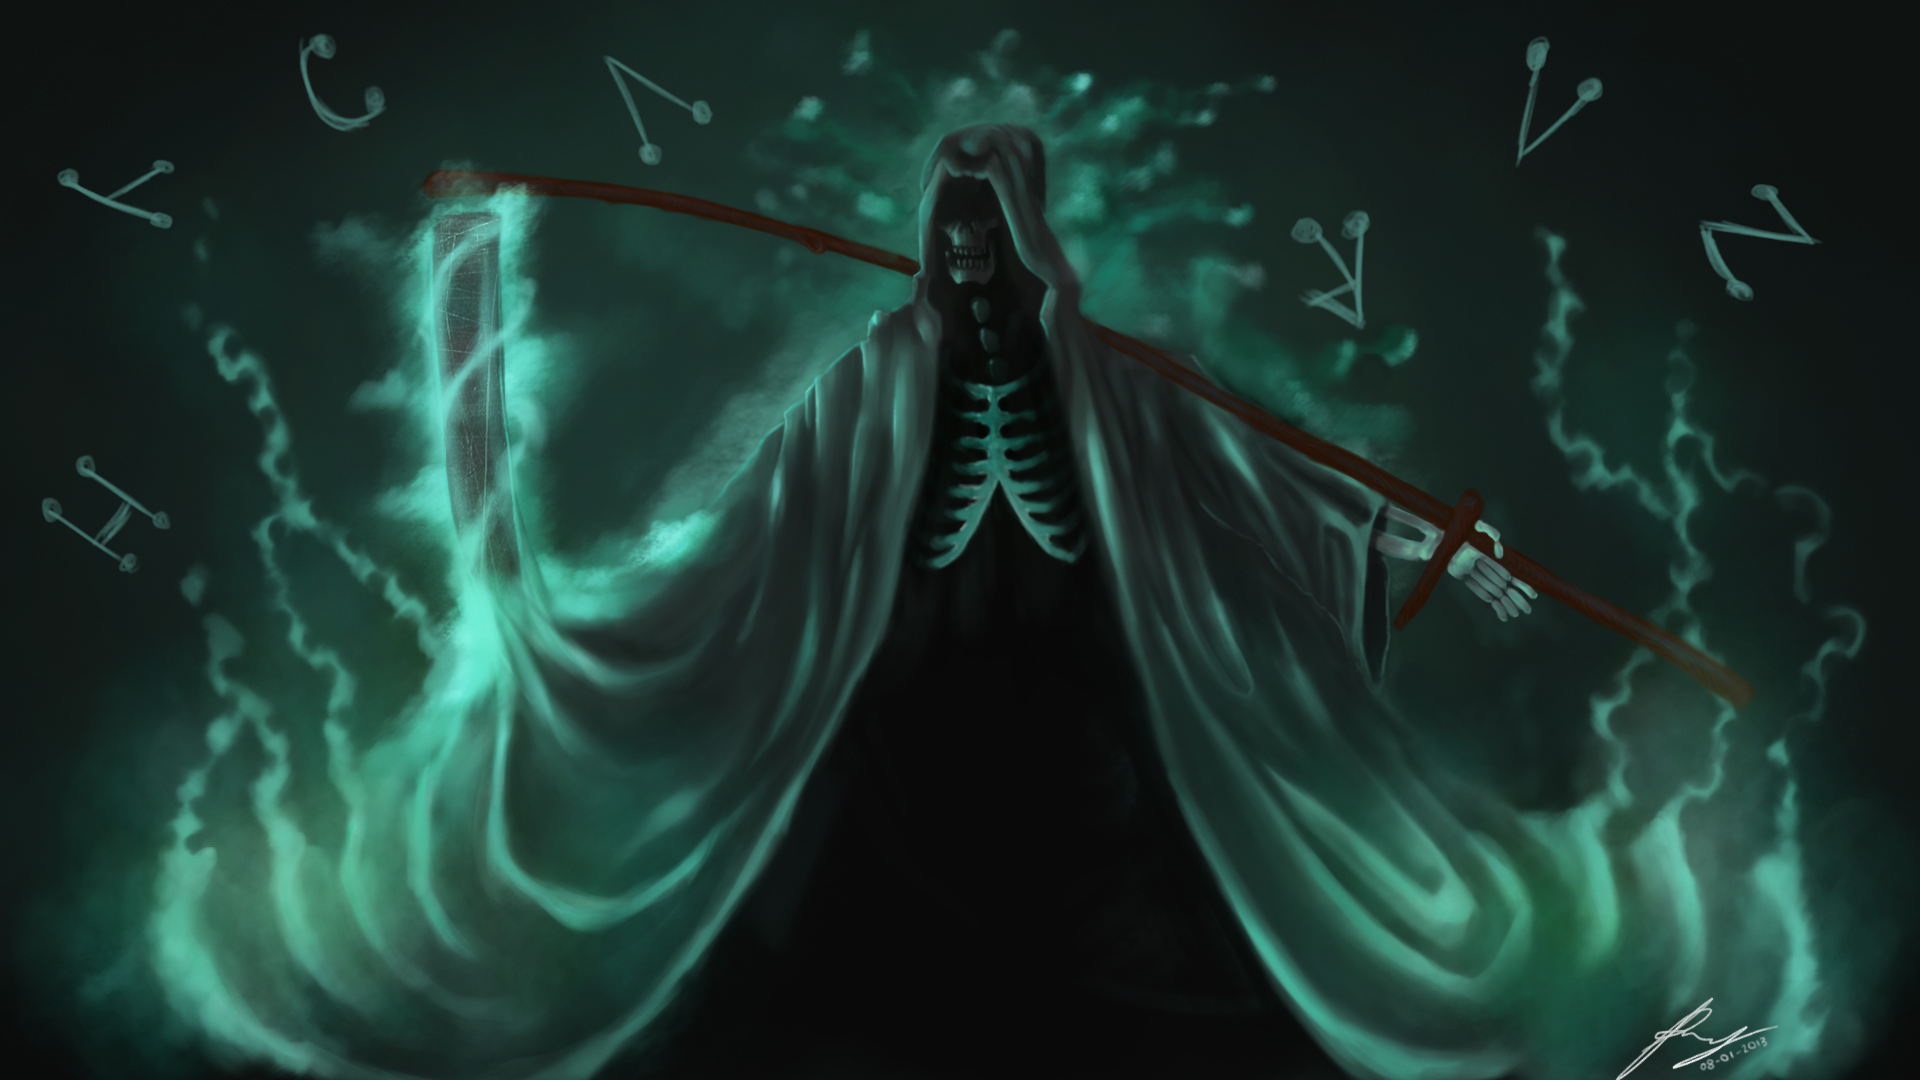 reaper anime wallpaper - photo #42